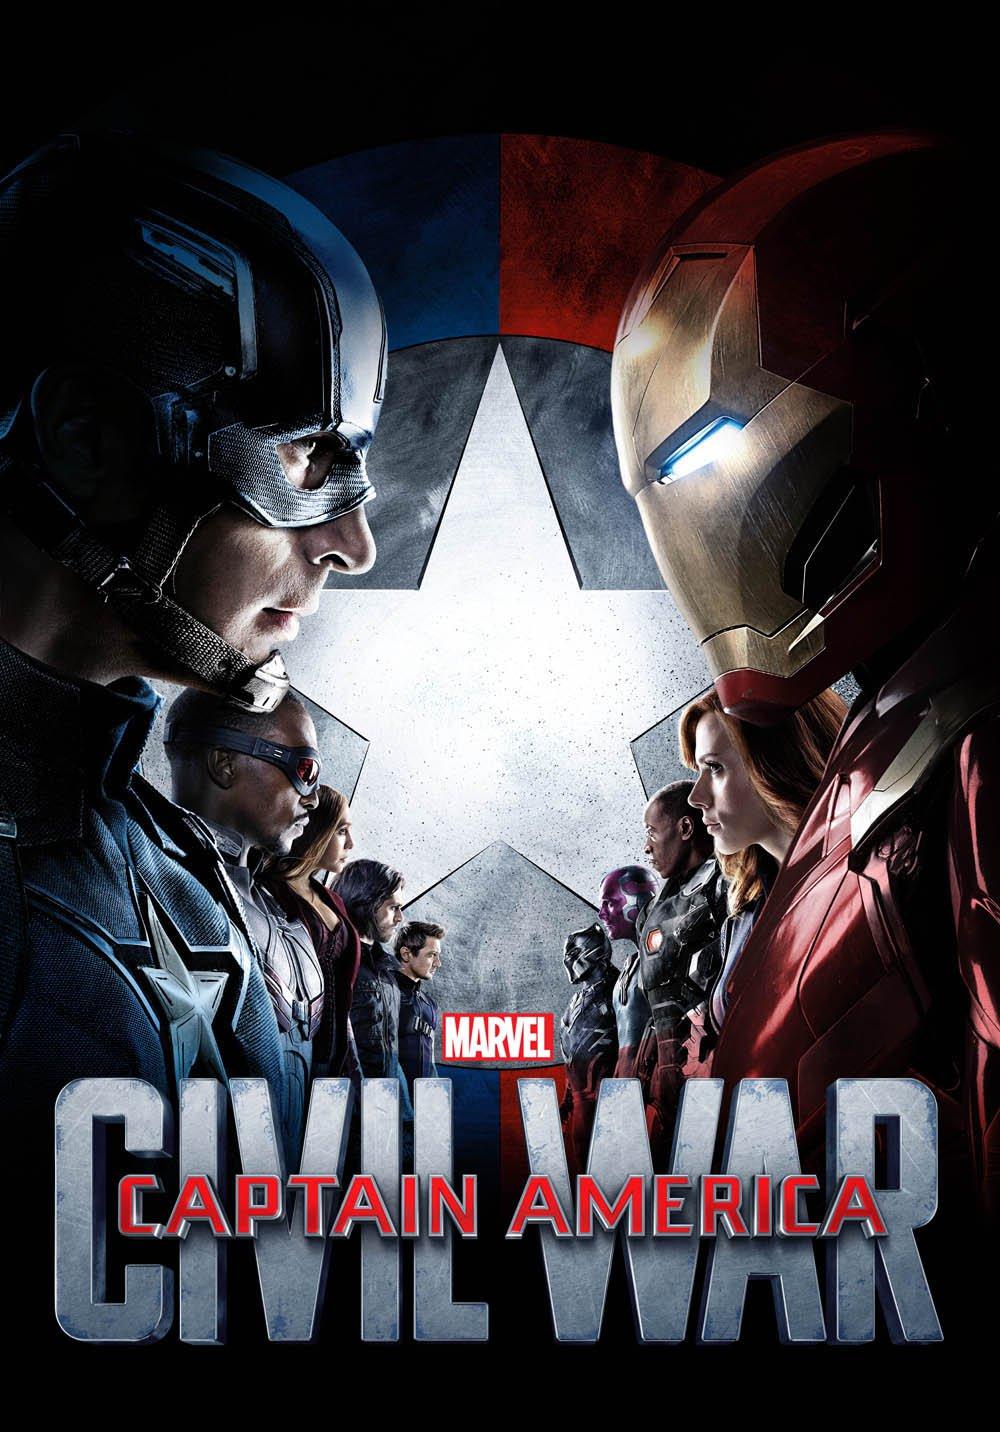 http://www.3dor2d.com/reviews/captain-america-civil-war